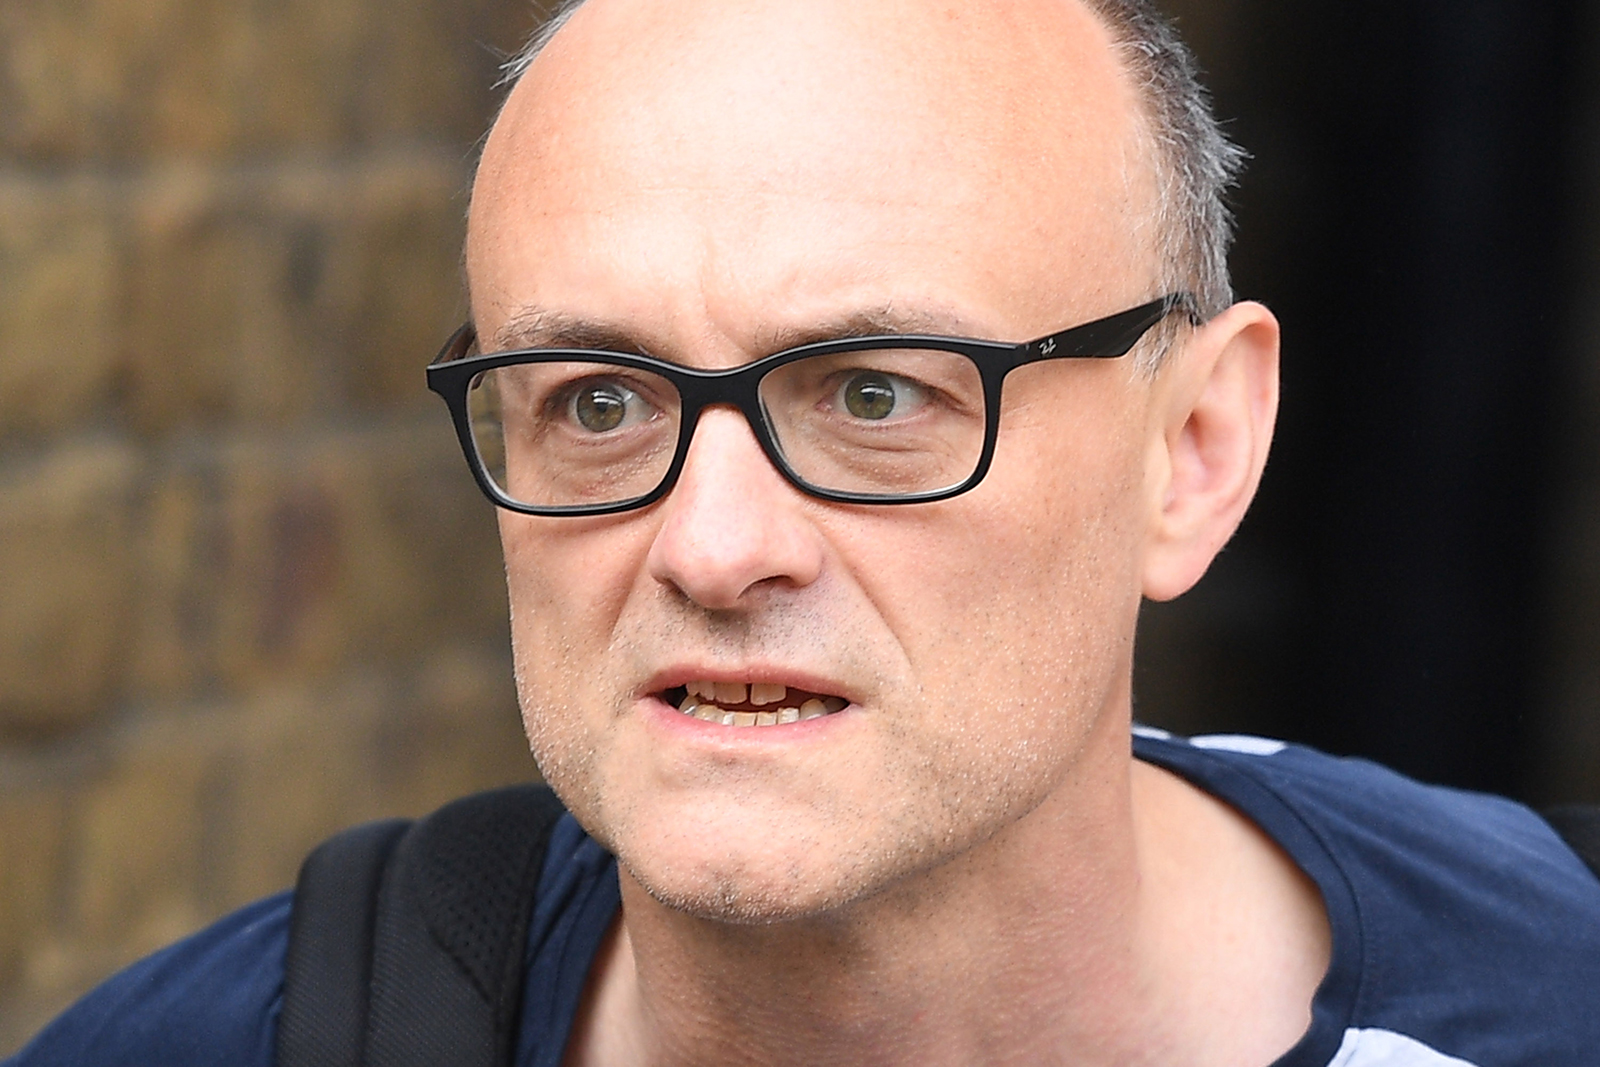 Dominic Cummings, Chief Advisor to Prime Minister Boris Johnson, in London on May 26.